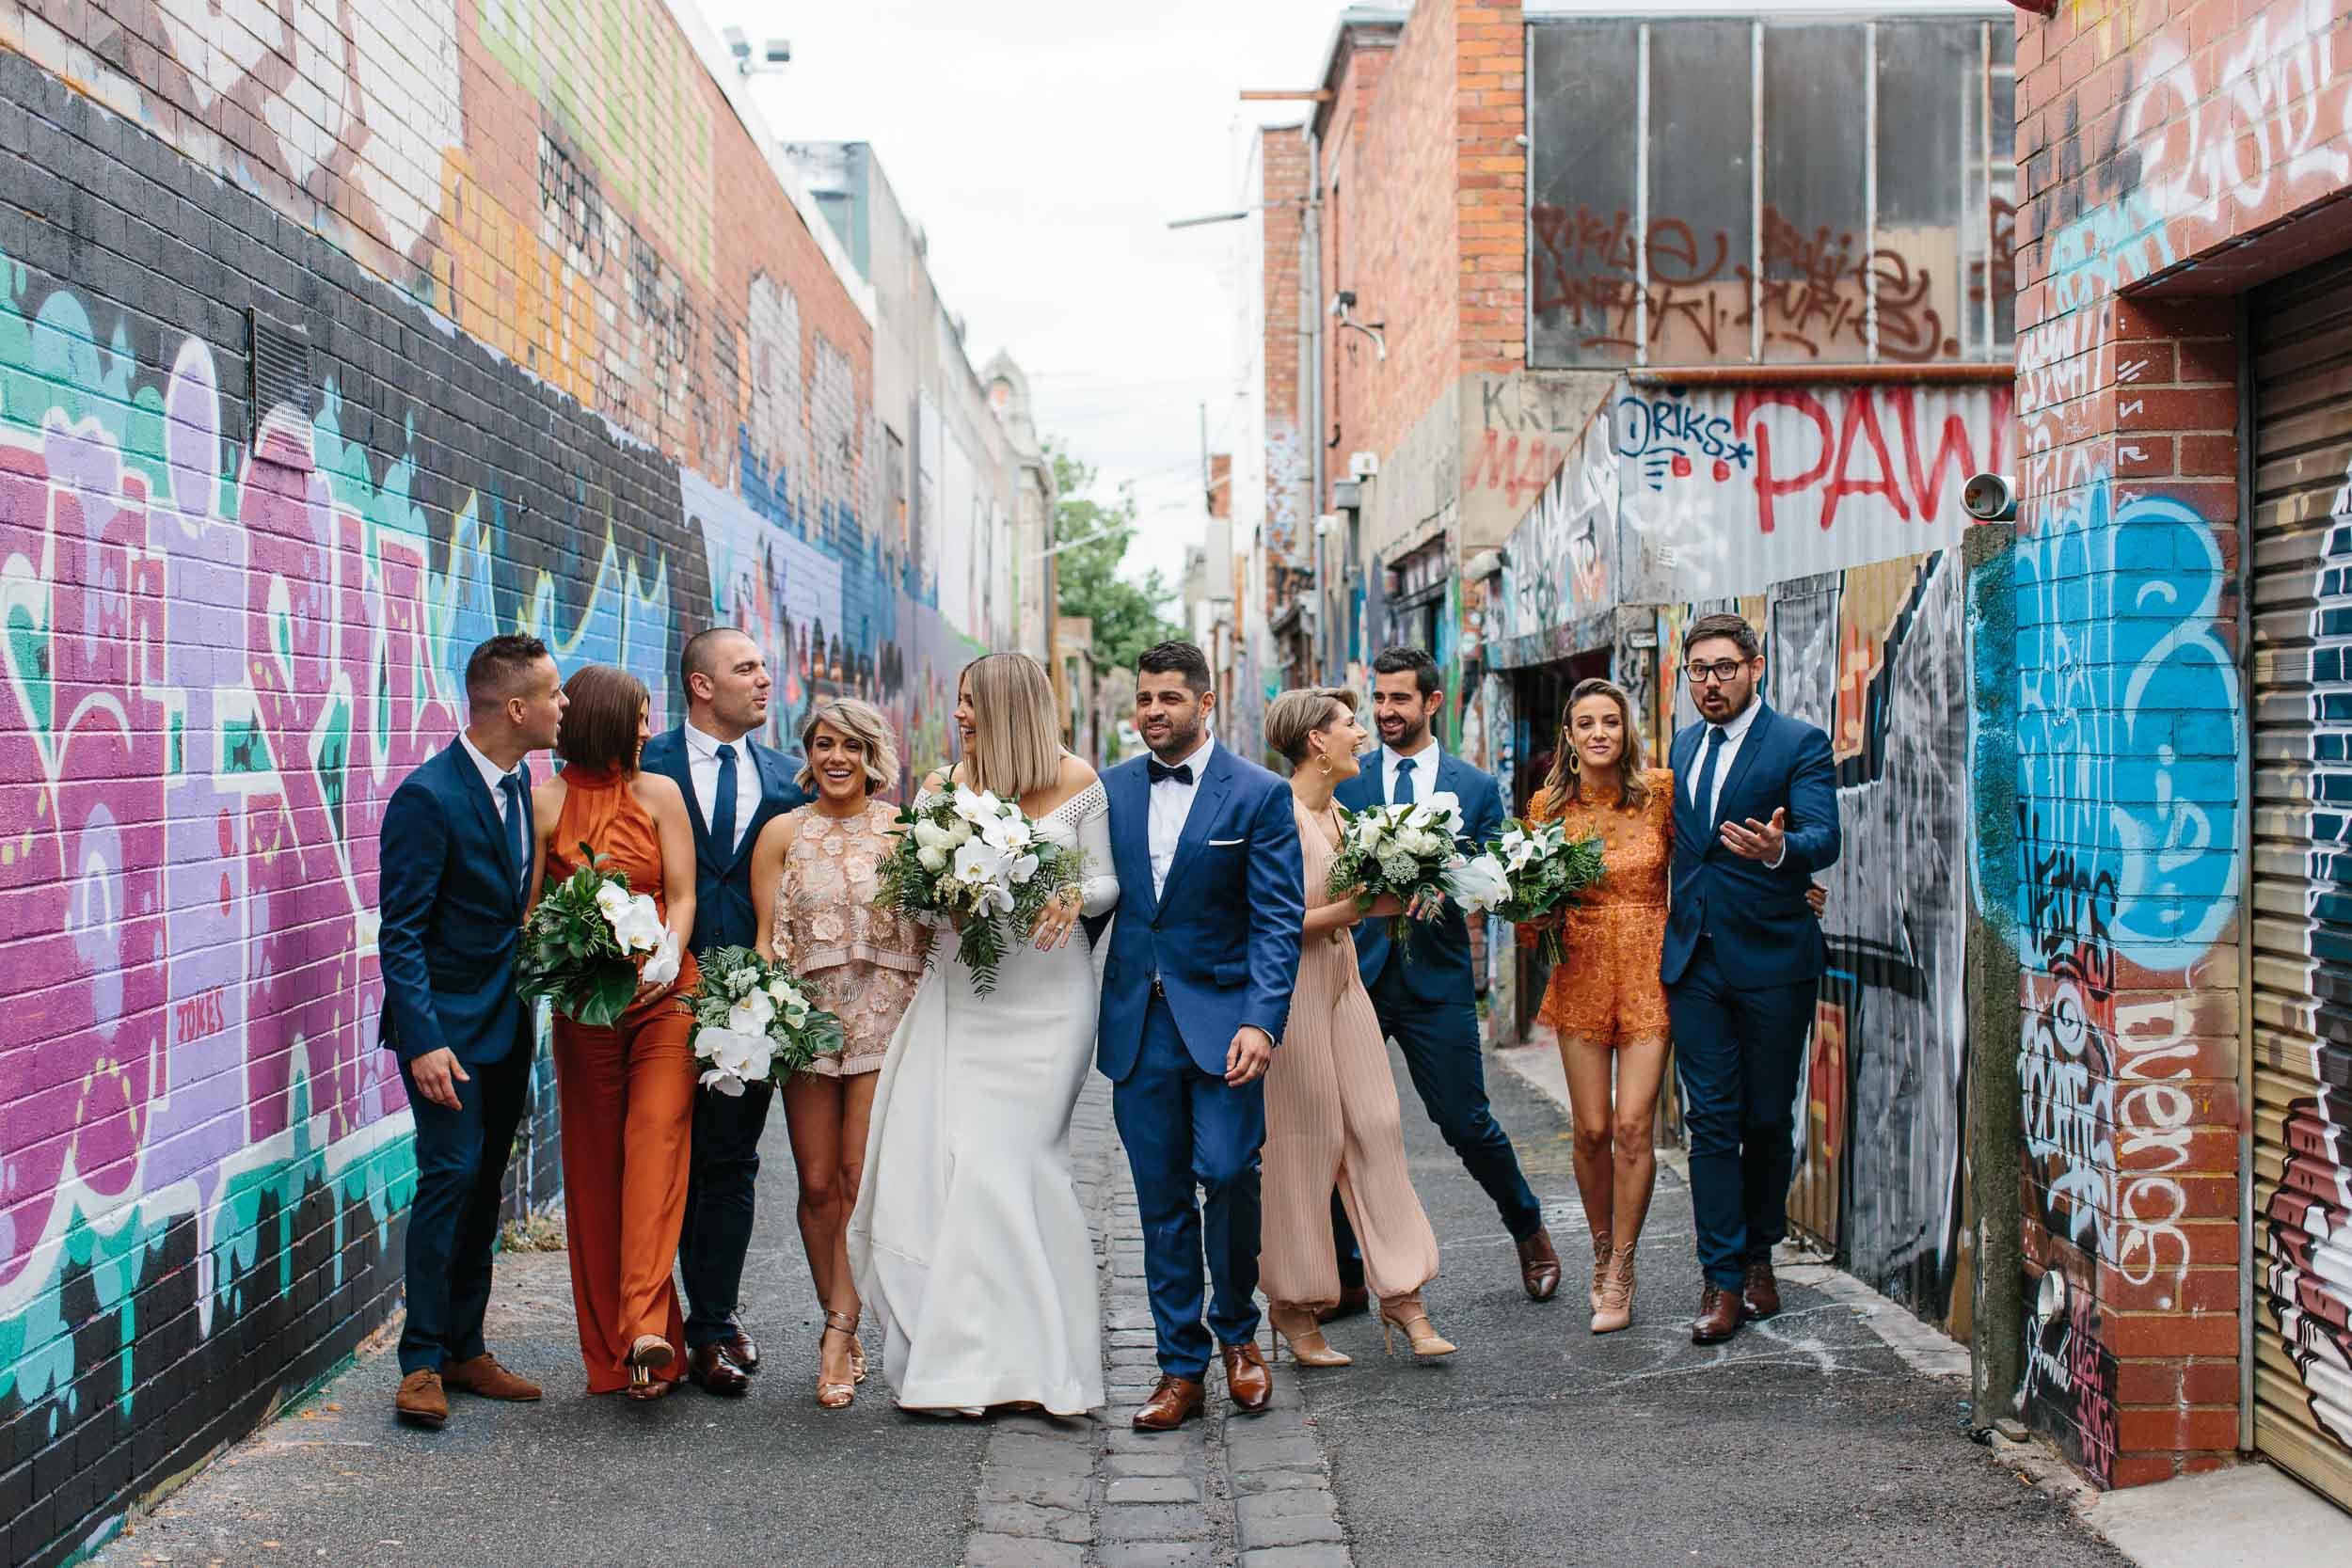 Kas-Richards-Urban-Melbourne-Wedding-Jason-Grech-462.jpg